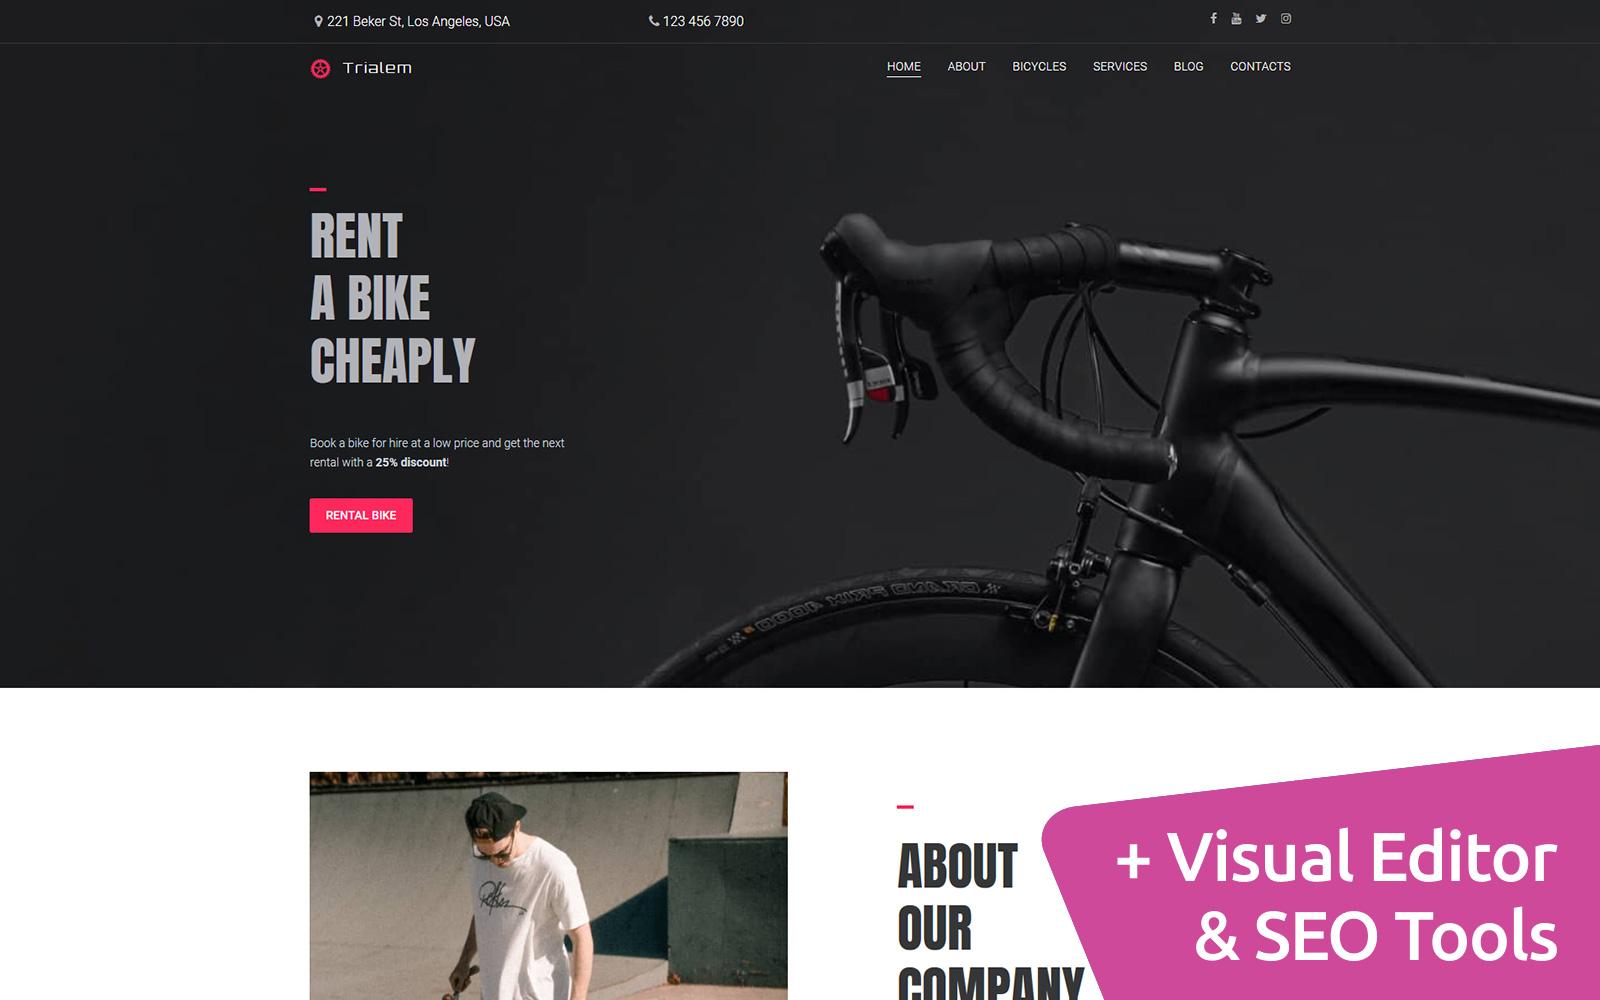 Trialem - Bike Rental №101735